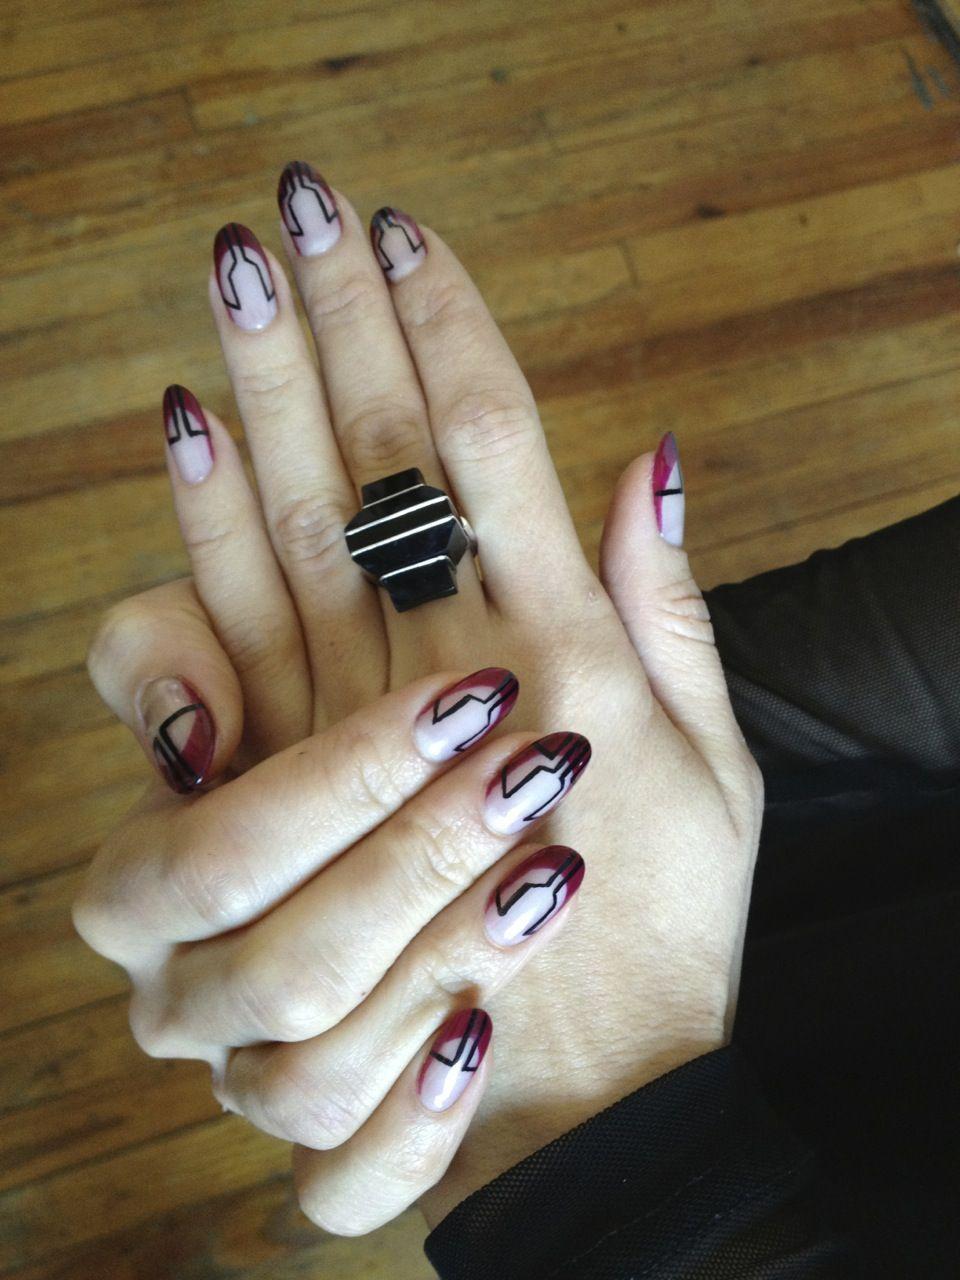 art deco nails. | Nails by Bliss. | Pinterest | Art deco nails ...